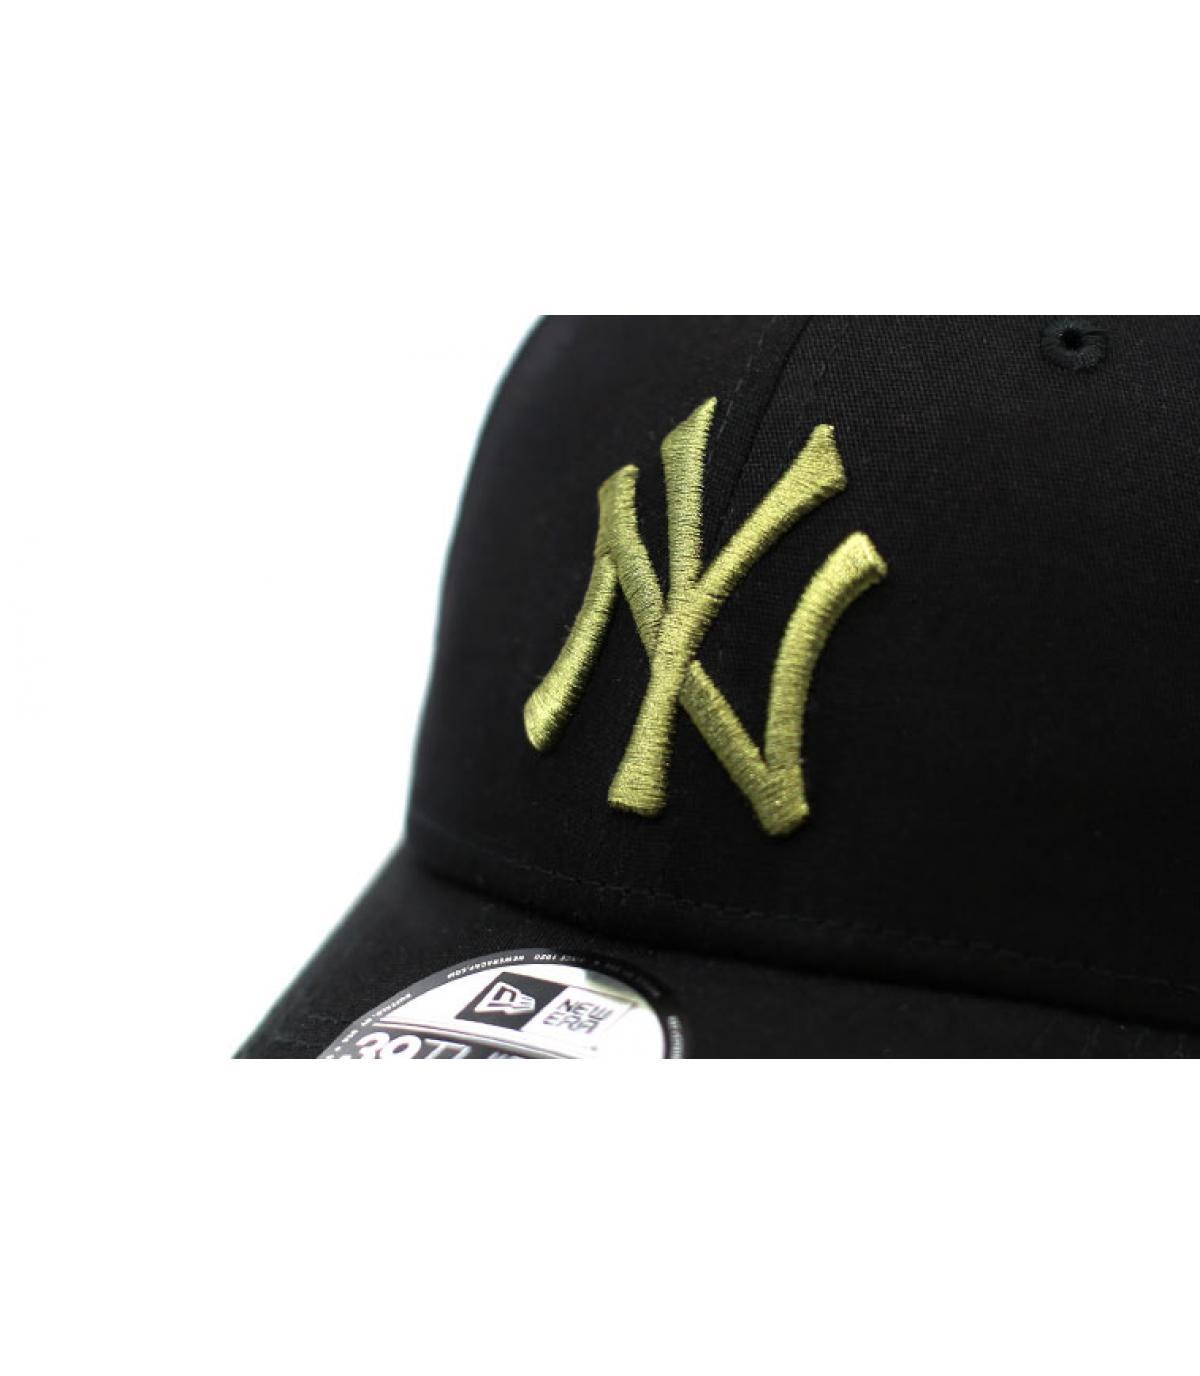 Details Cap League Ess NY 39Thirty black olive - Abbildung 3